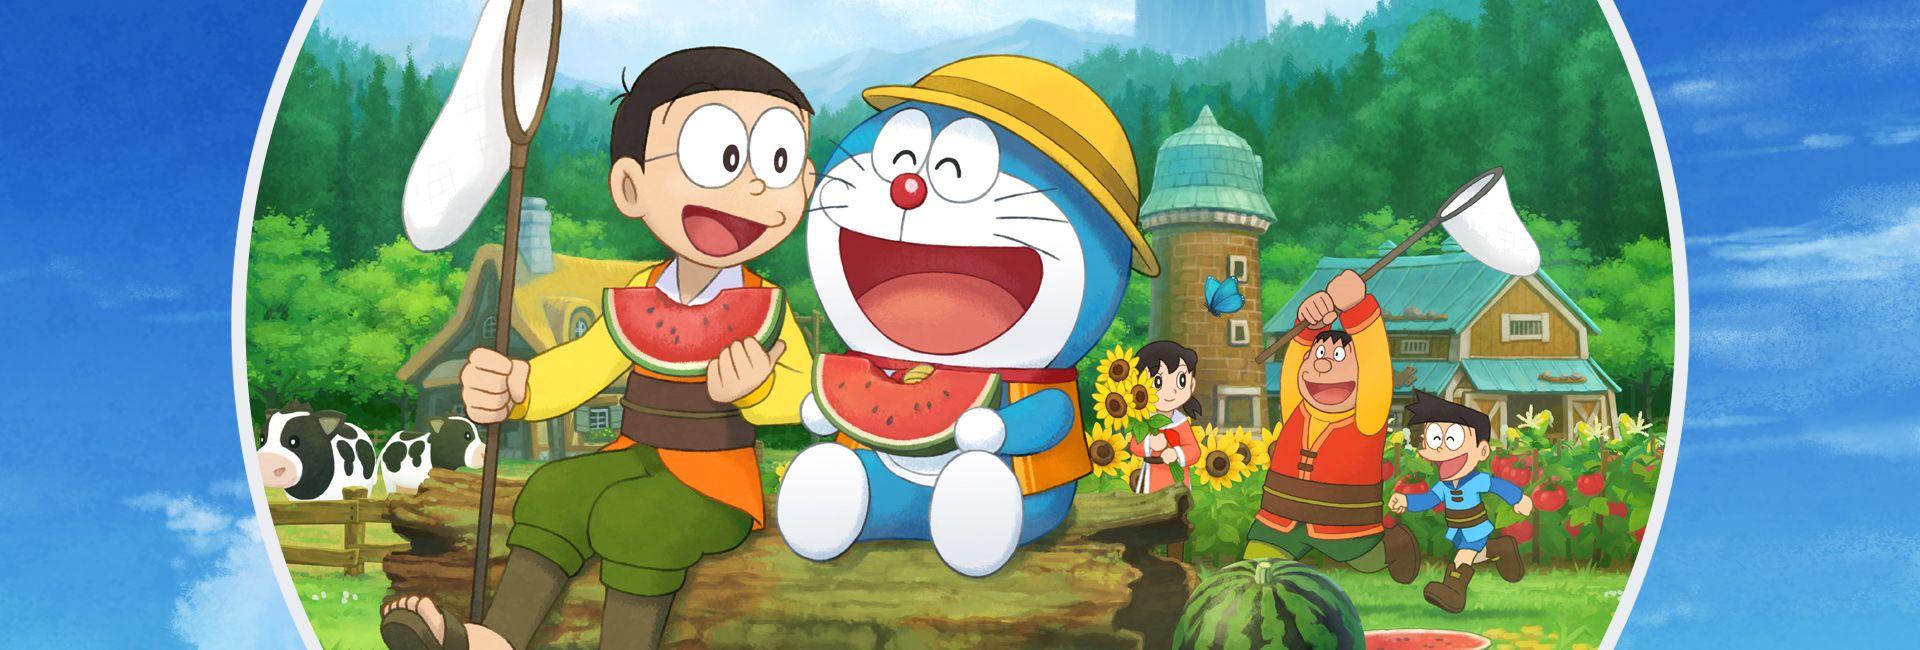 Doraemon, Nobita Nobi, and his friends in a heart-warming journey to create and nurture a flourishing farm